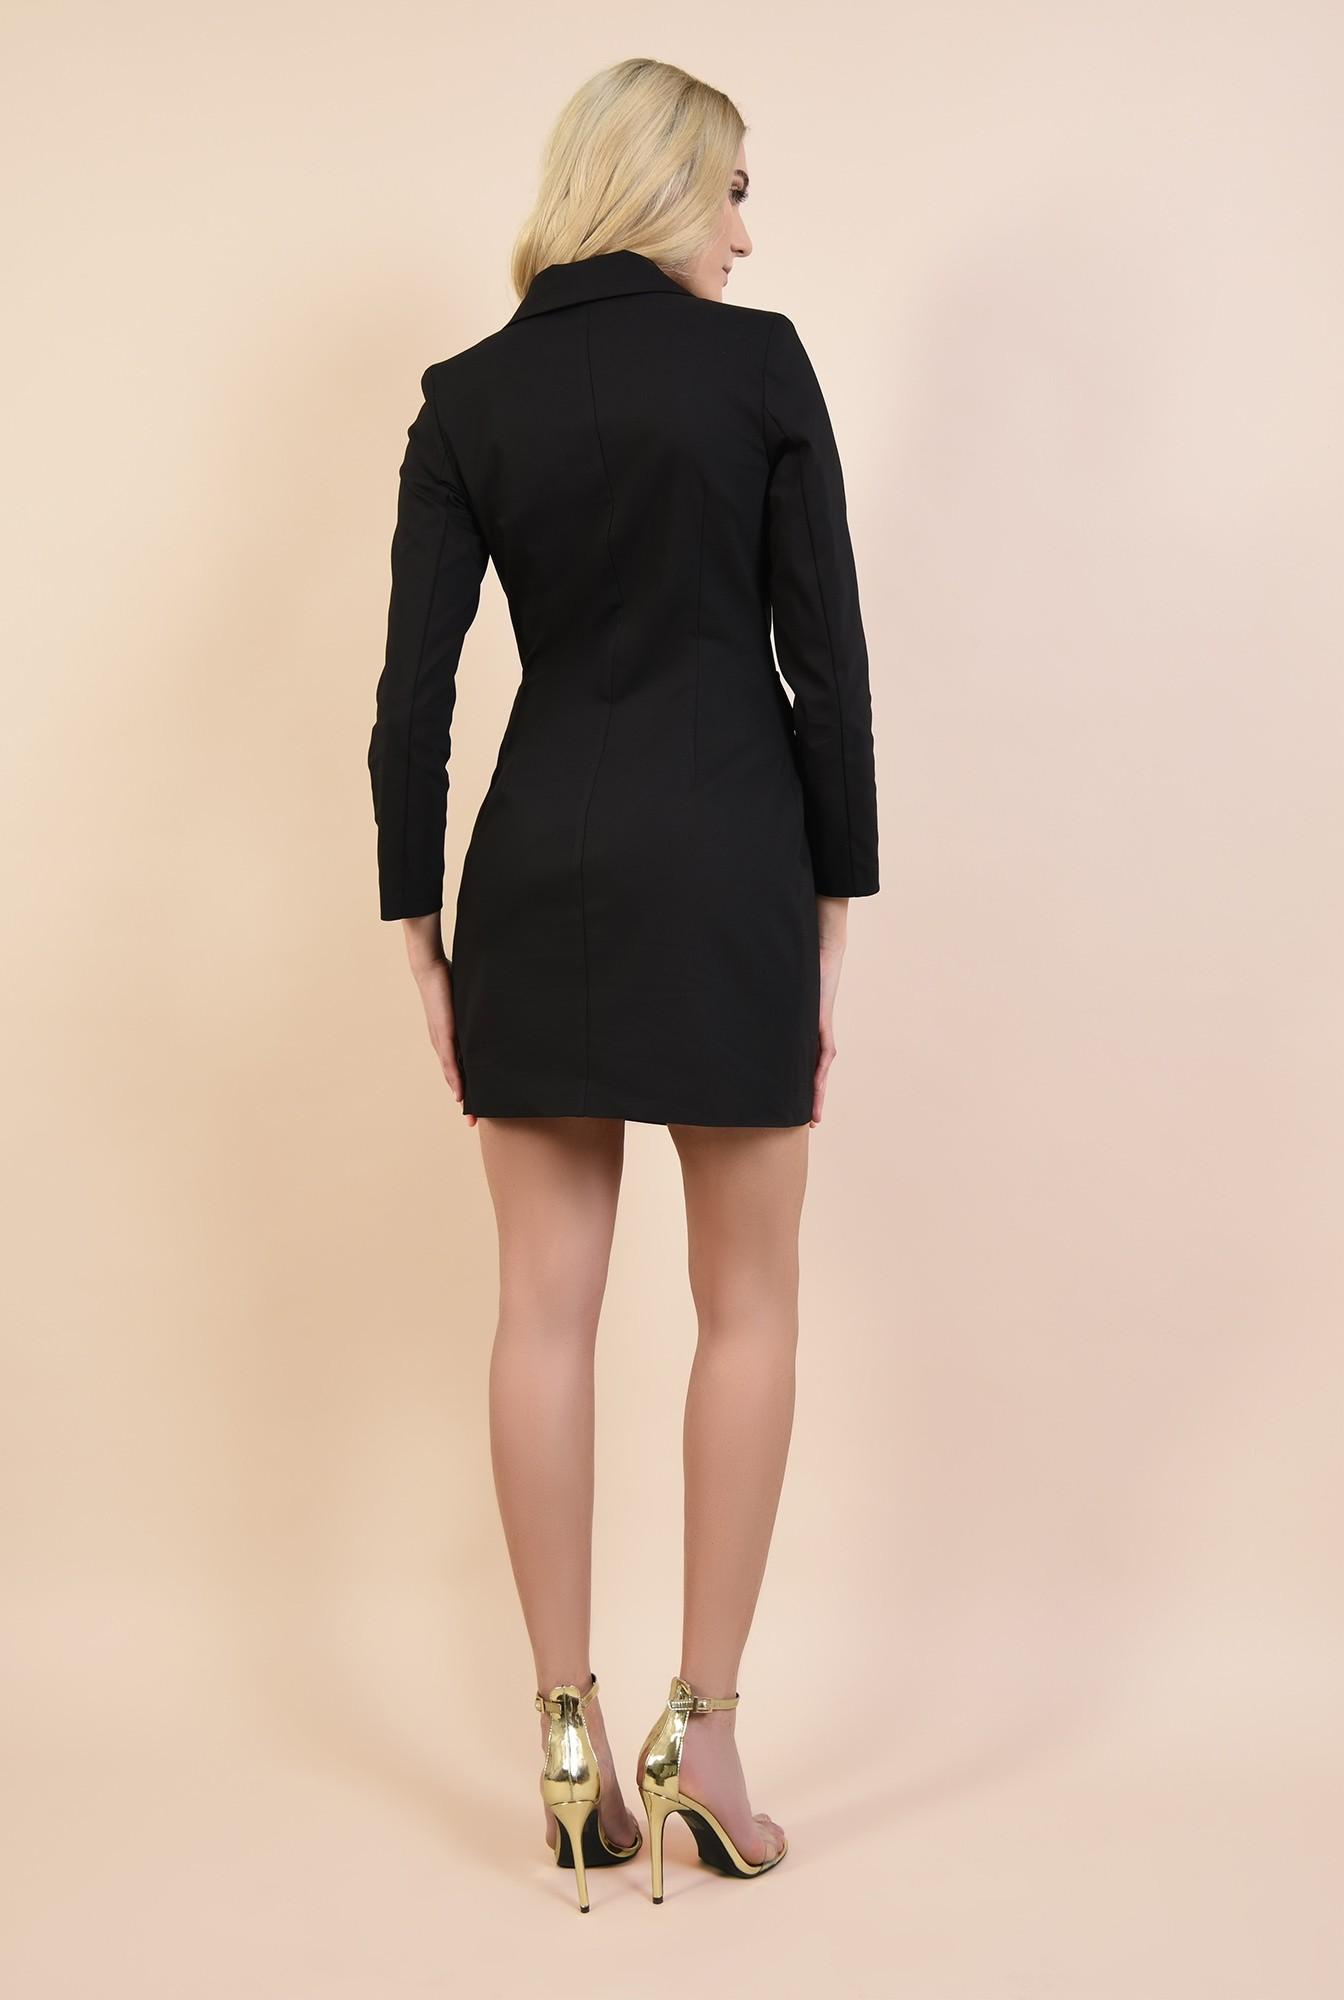 1 - rochie sacou, neagra, scurta, cambrata, rochie de ocazie